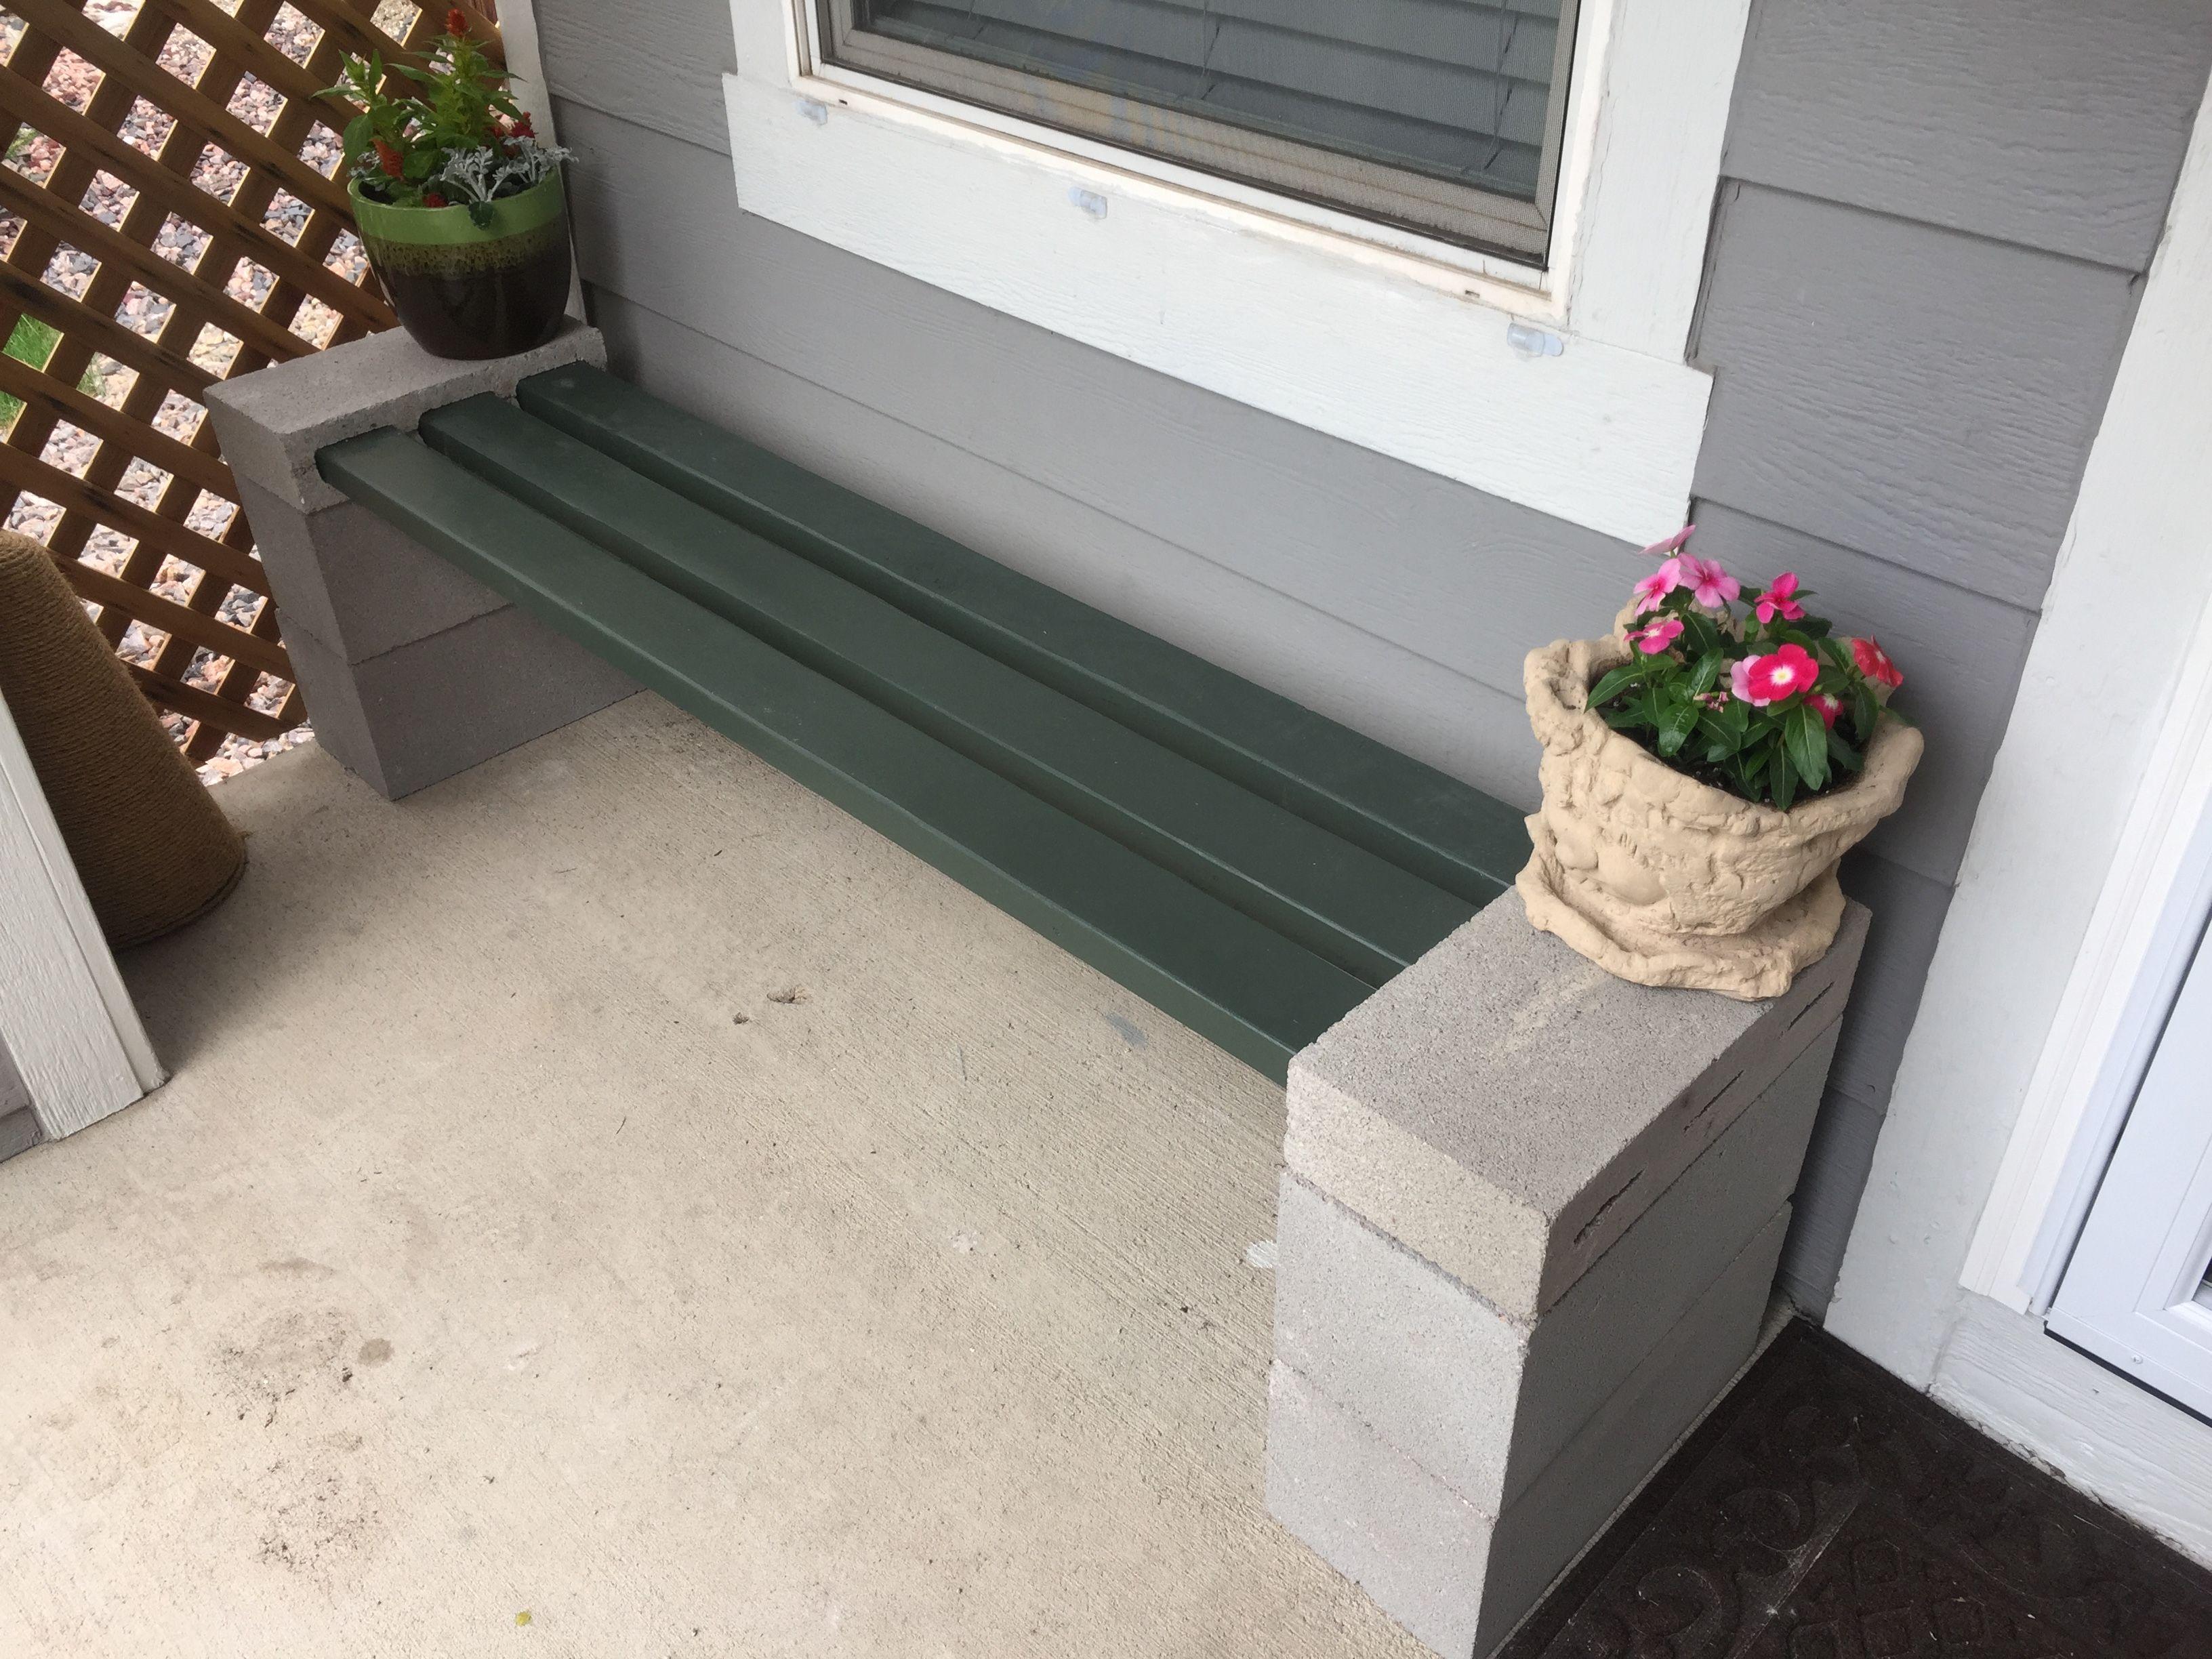 Diy Cinder Block And 2x4 Bench In 2019 Cinder Block Bench